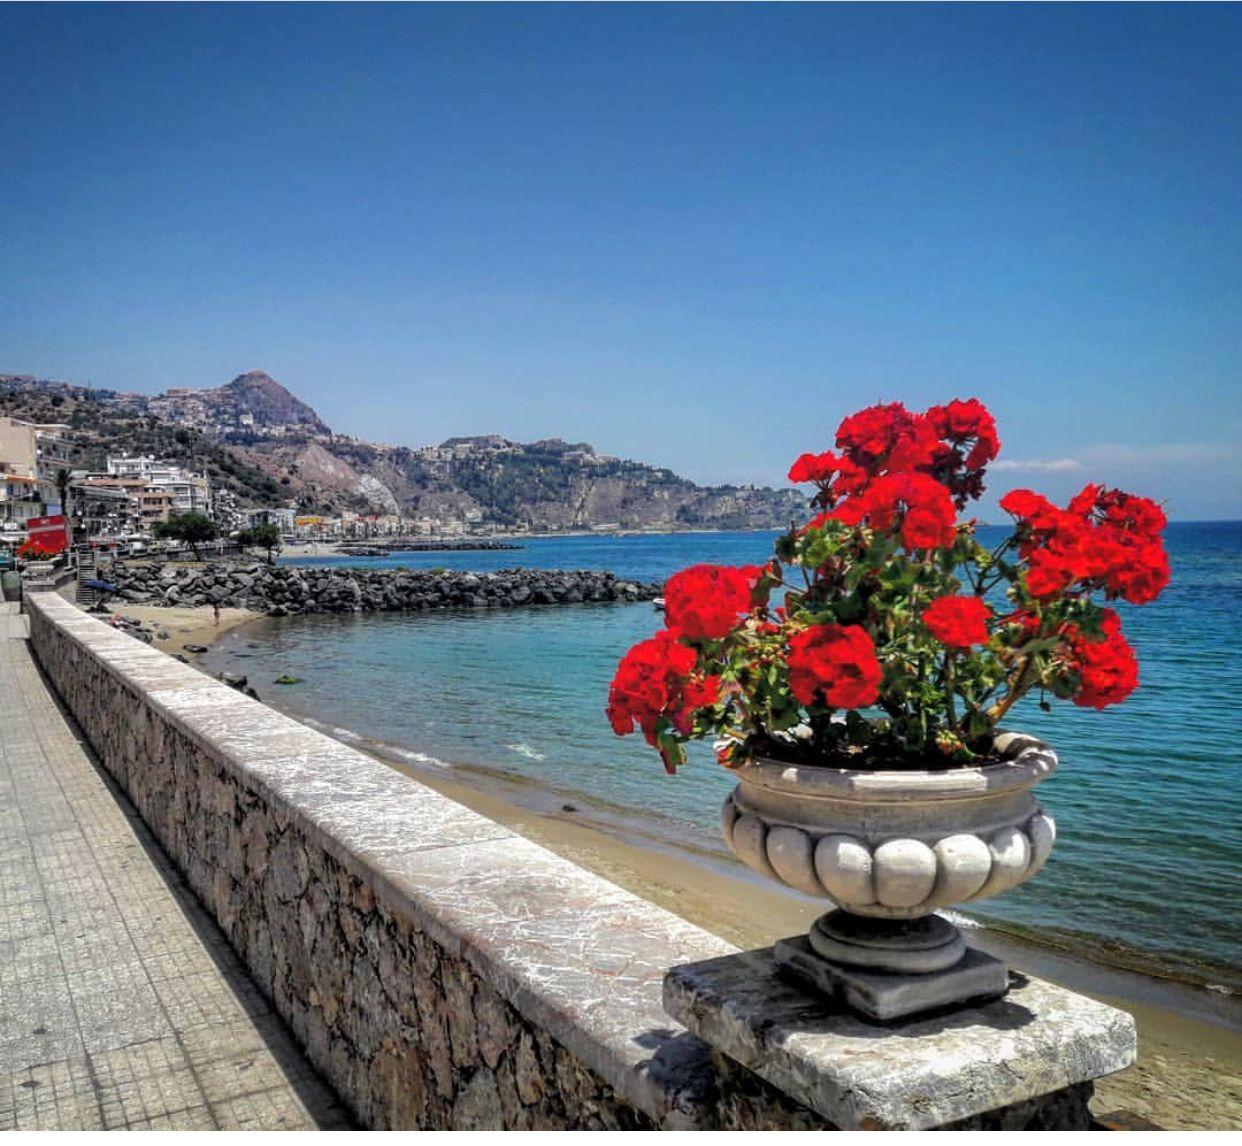 ROBYMOD79 in Giardini, Naxos, Italy Breathes Beauty Be